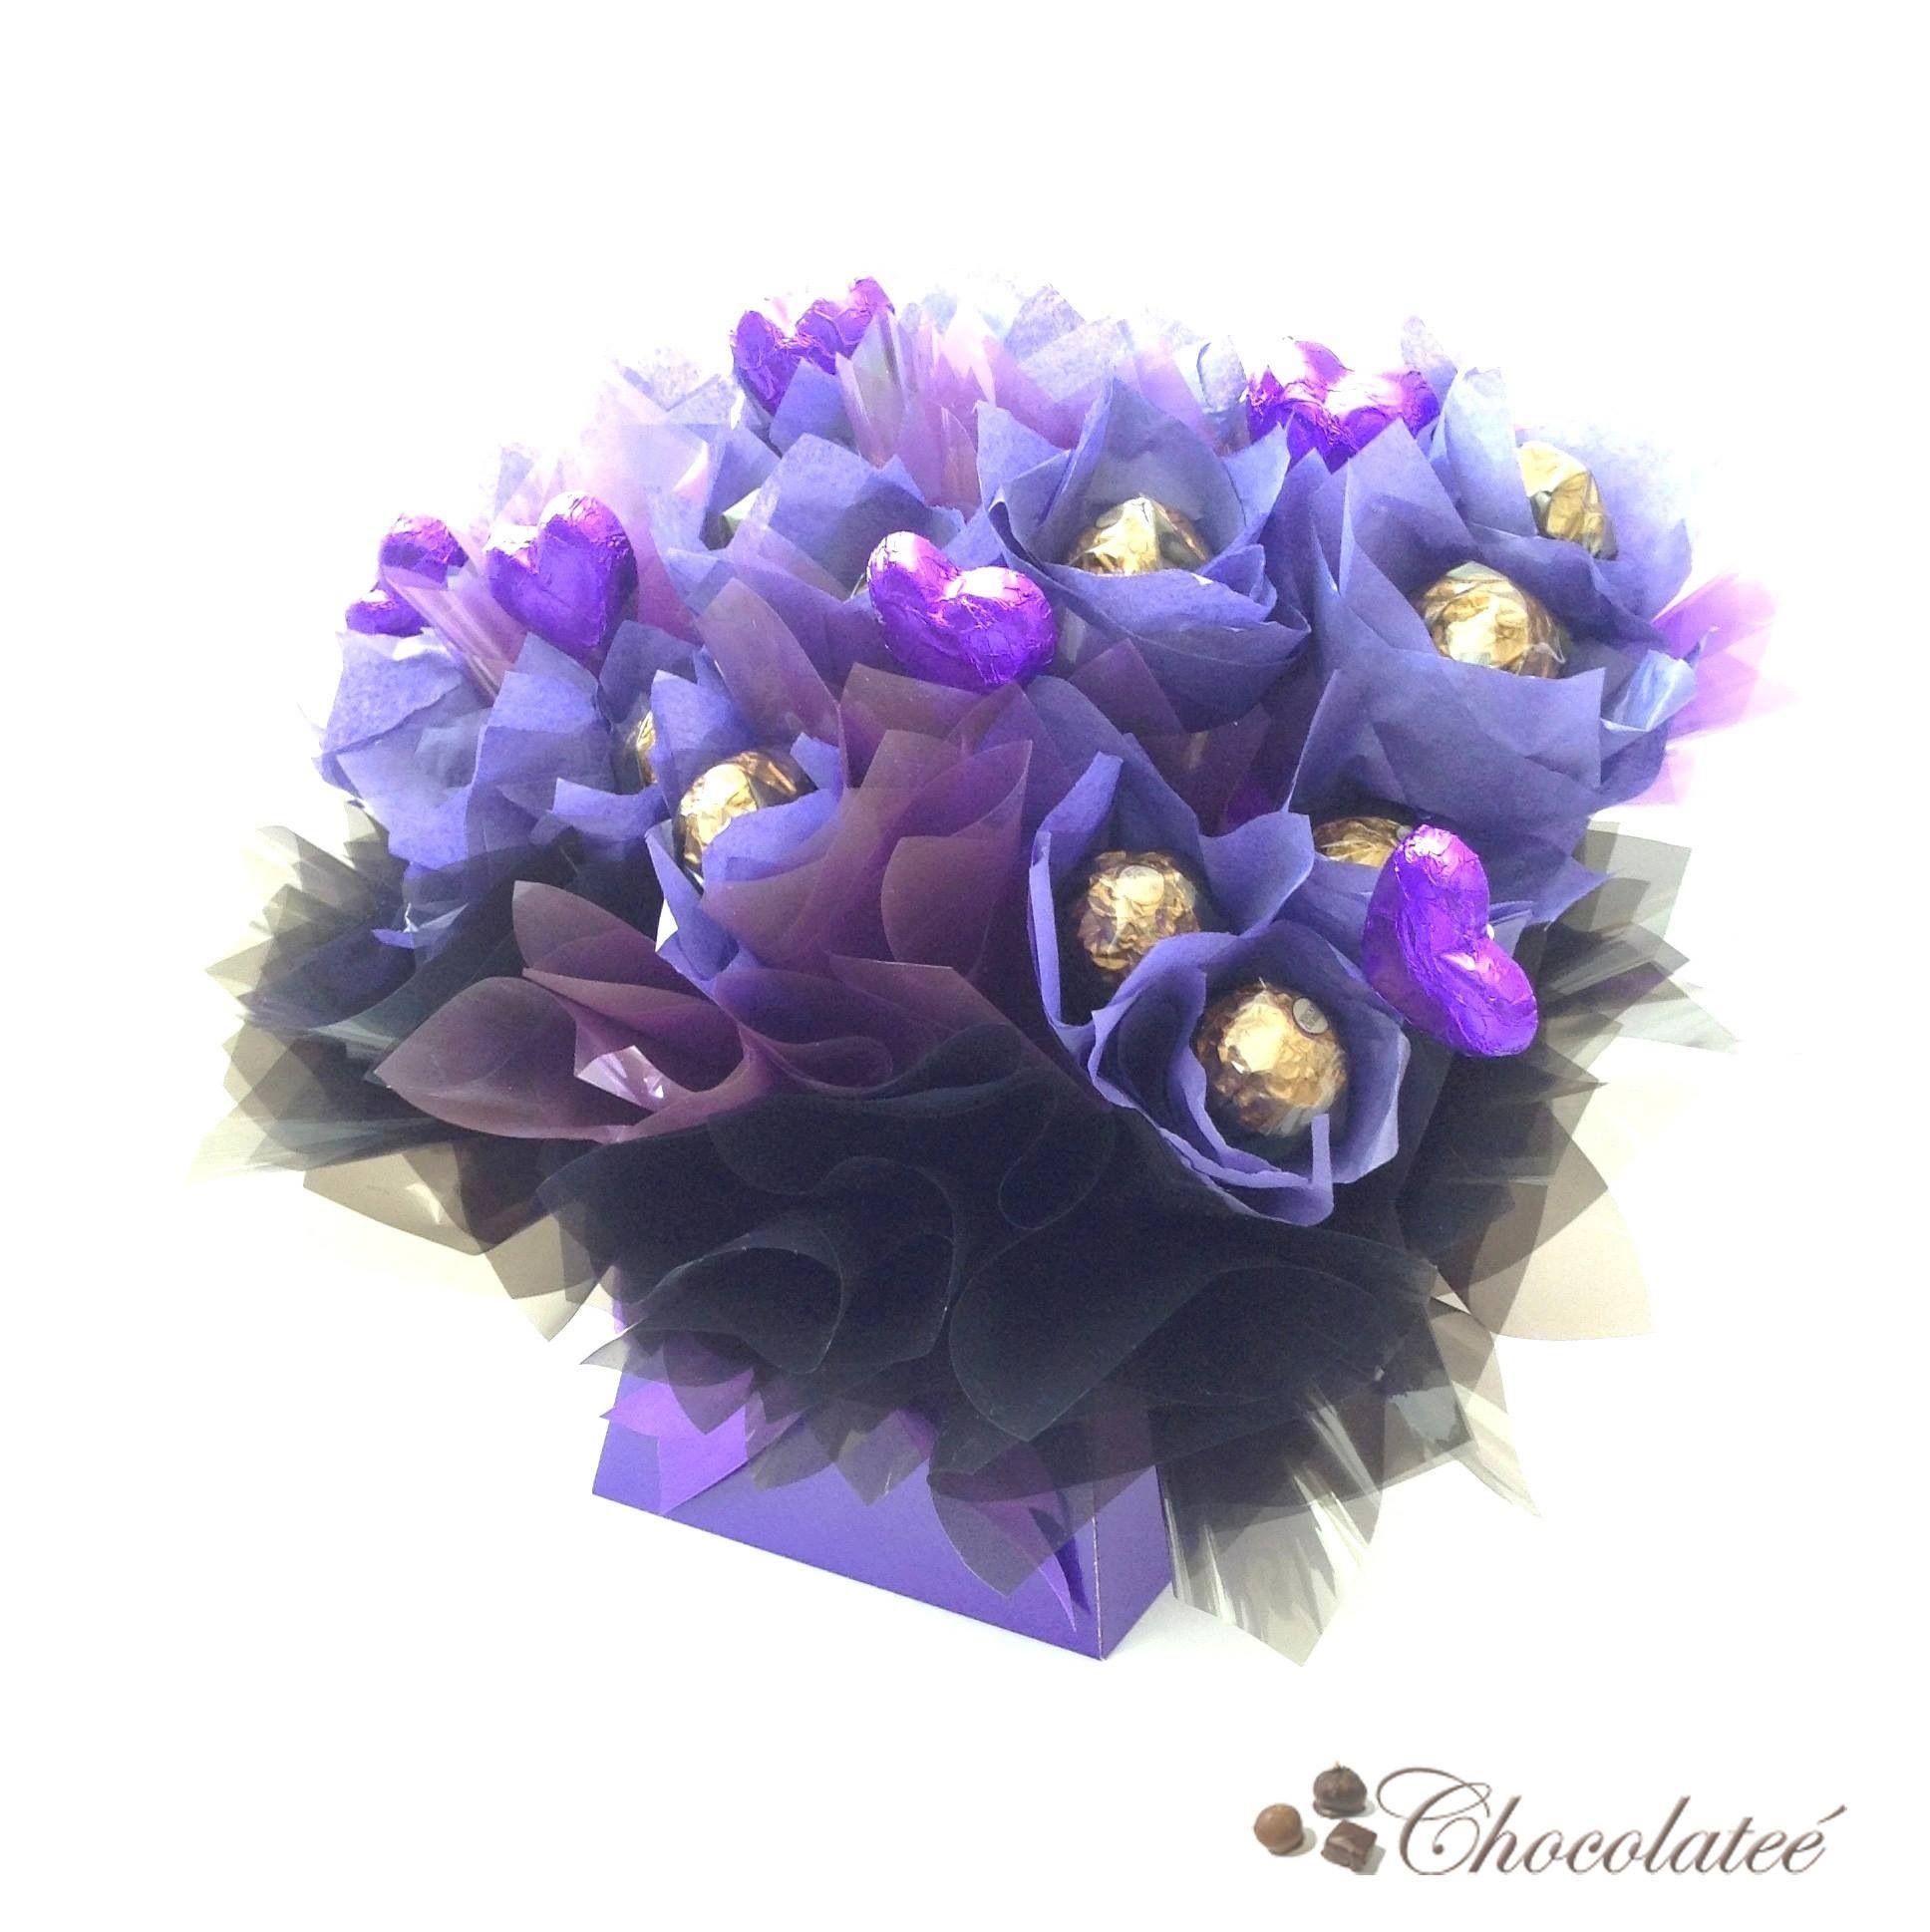 Purple passion luxury ferrero rocher bouquet httpchocolatee purple passion luxury ferrero rocher bouquet httpchocolatee izmirmasajfo Images